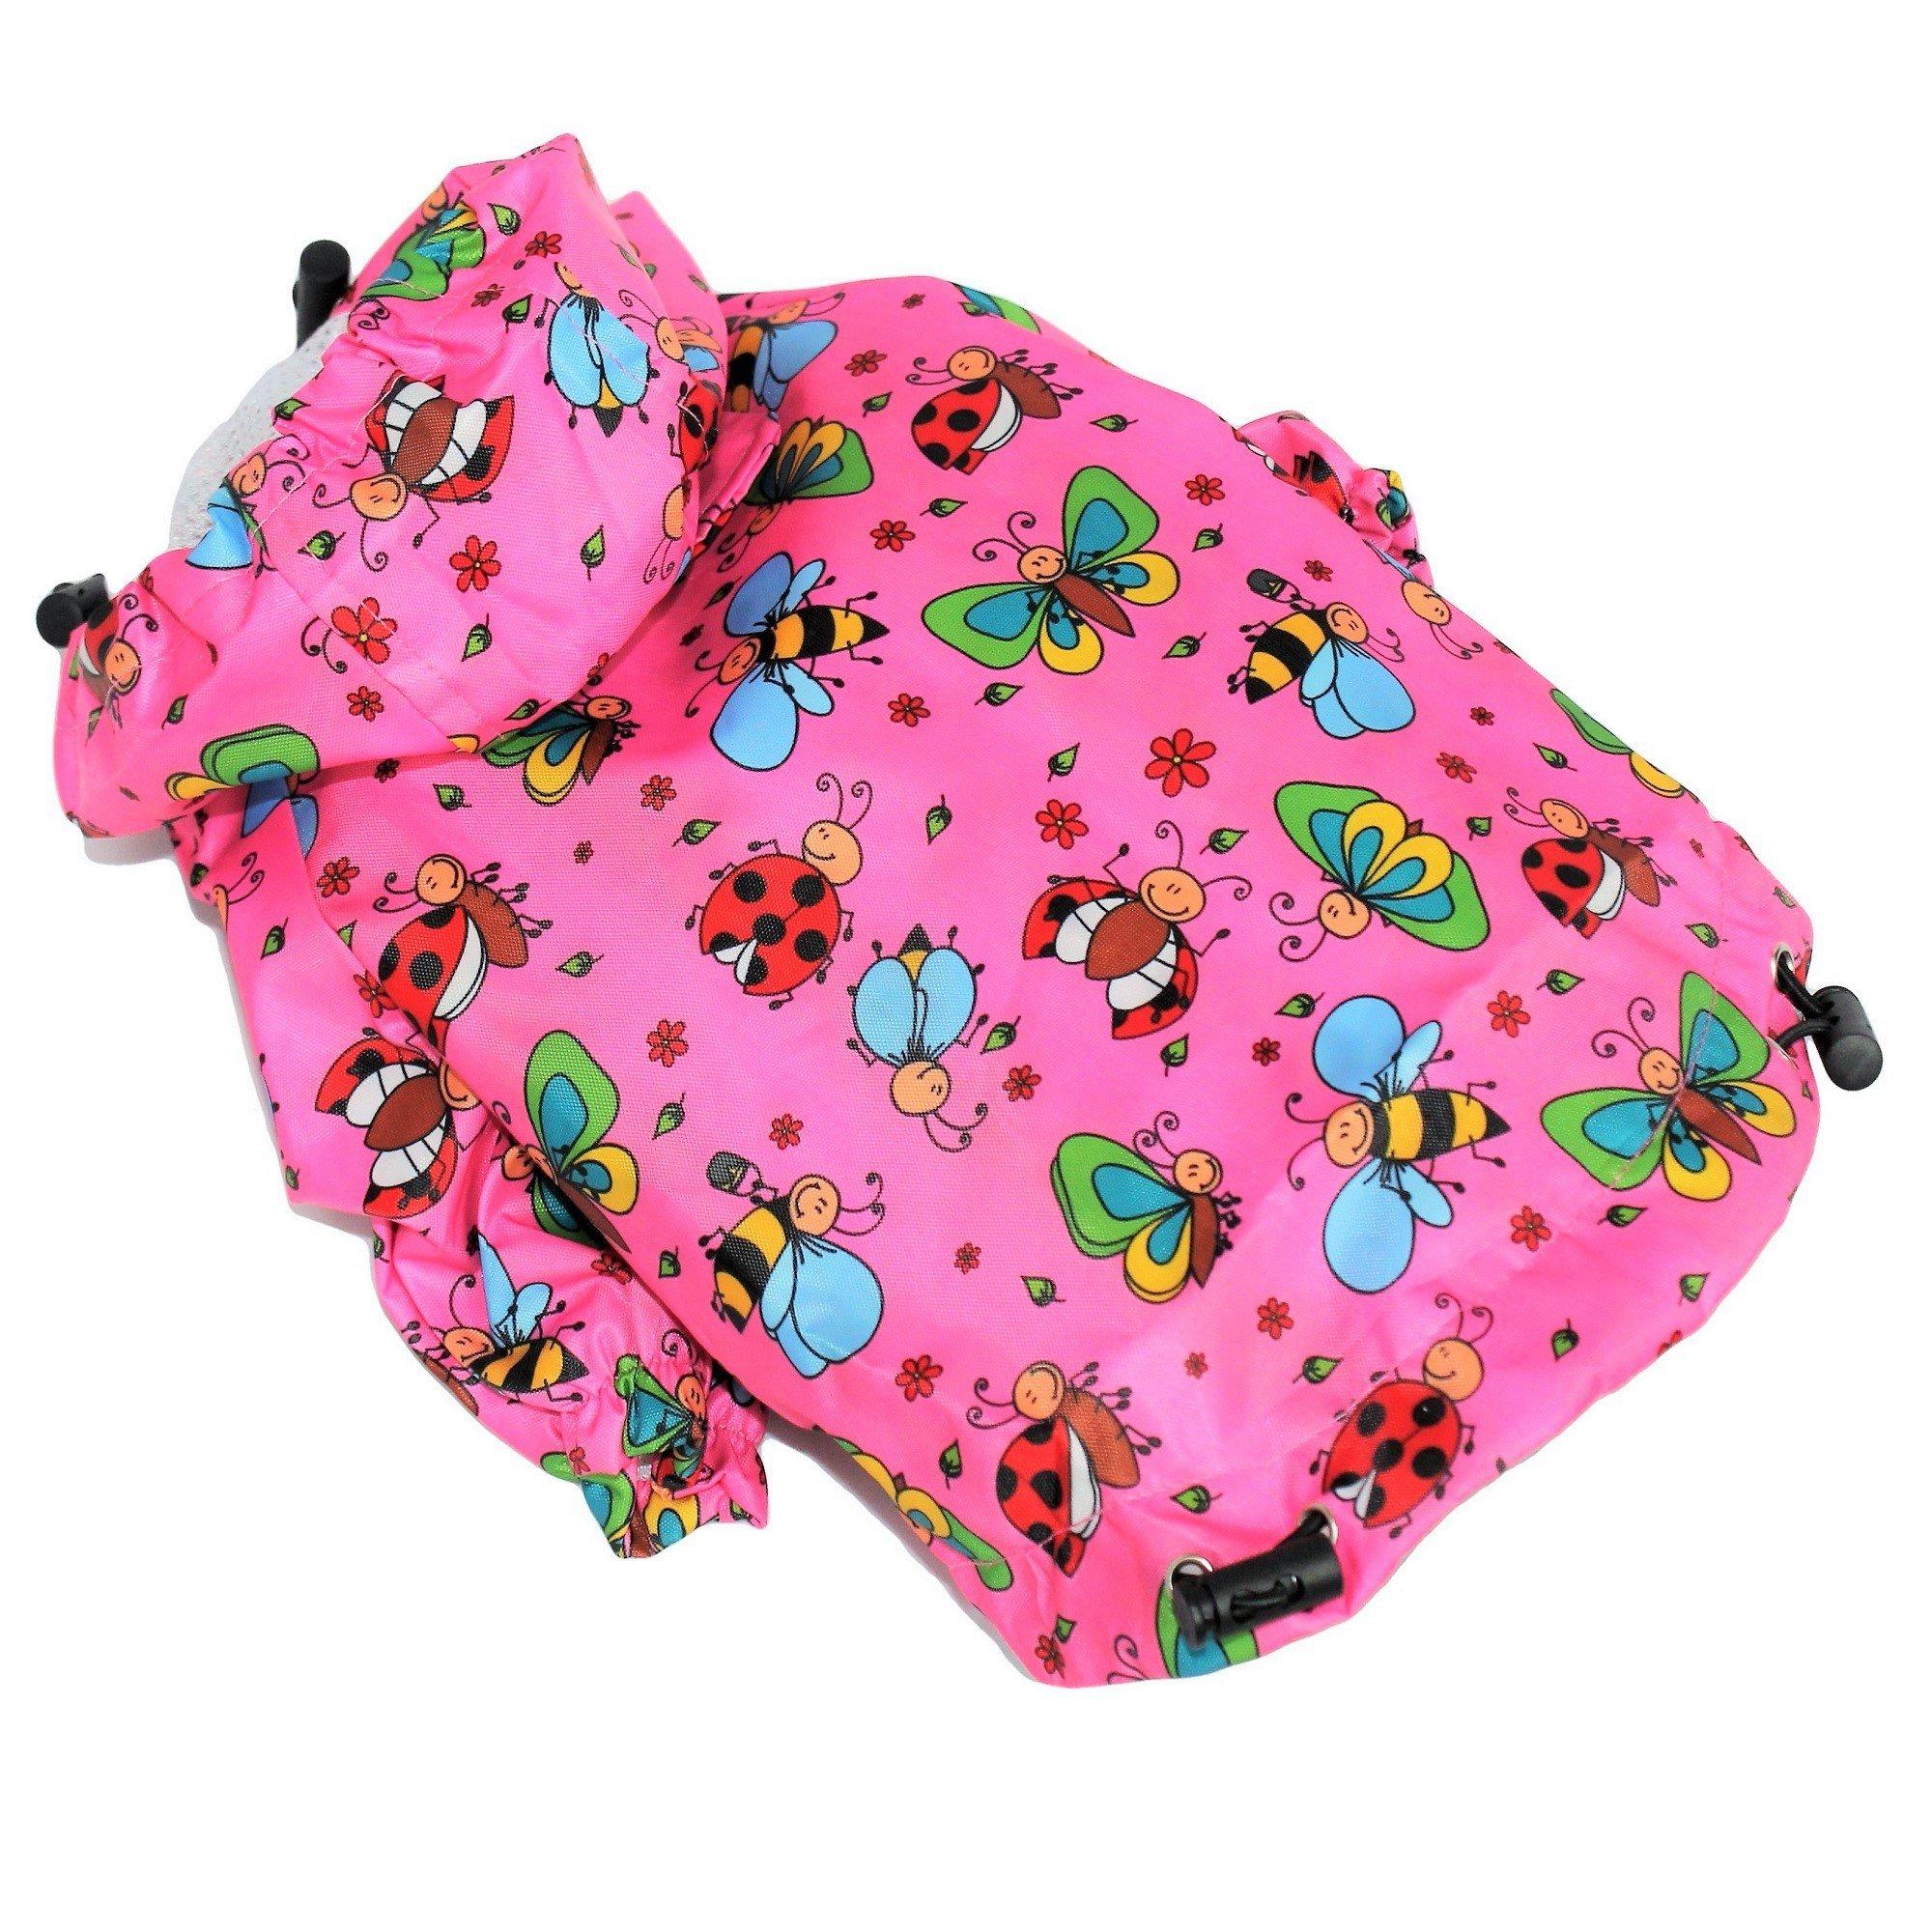 FunnyDogClothes For SMALL Pet Cat Dog RainCoat Hoodie Coat WATERPROOF Rain Jacket Rainwear (XXS: Length - 8'', PINK)